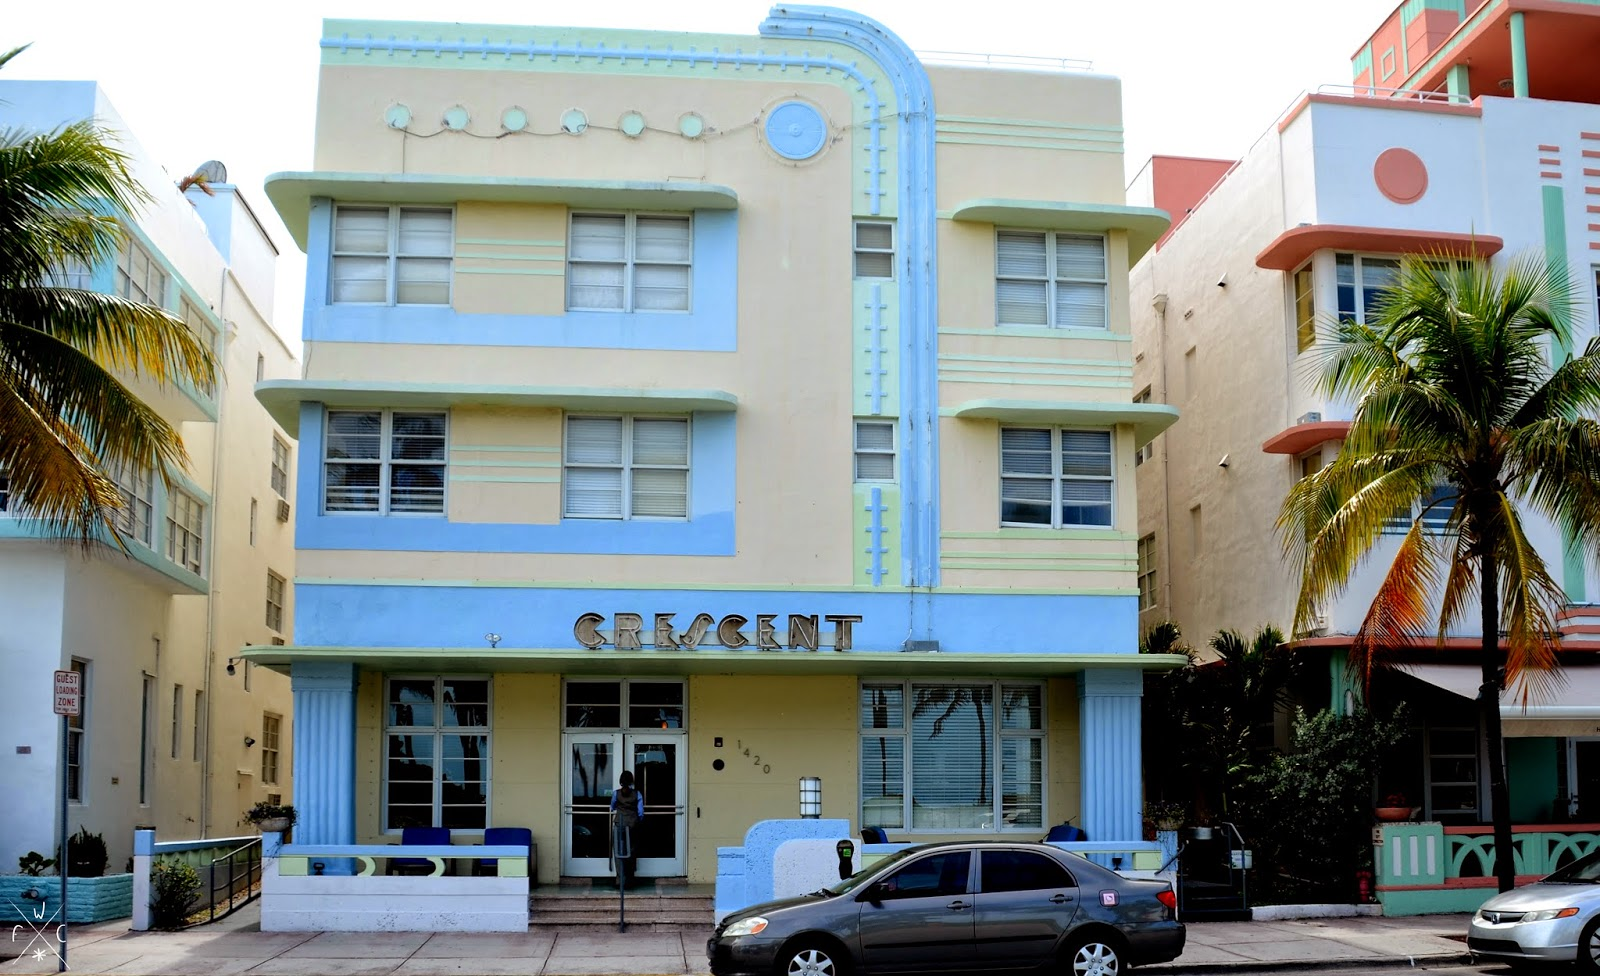 Crescent - Miami Beach, Floride, USA - Art Déco